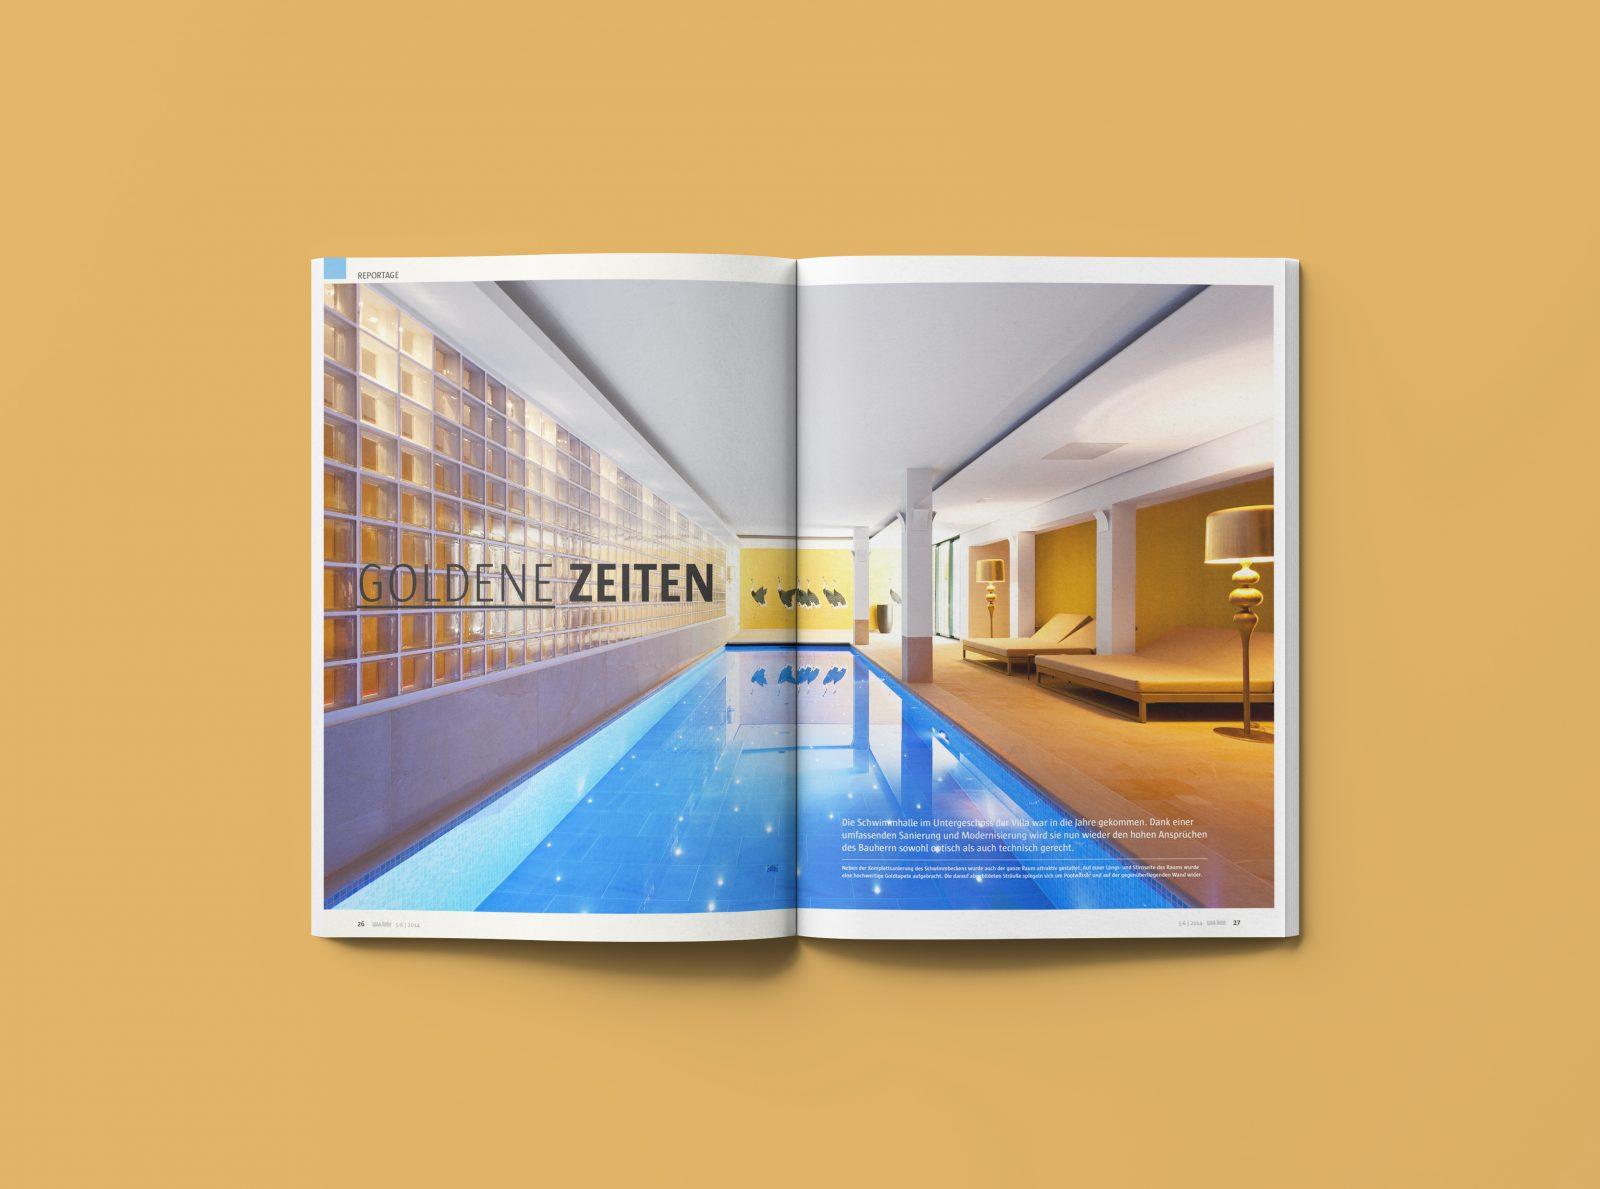 Hütel & Mess Schwimmbadfotografie Schwimmbadtechnik Swimmingpools